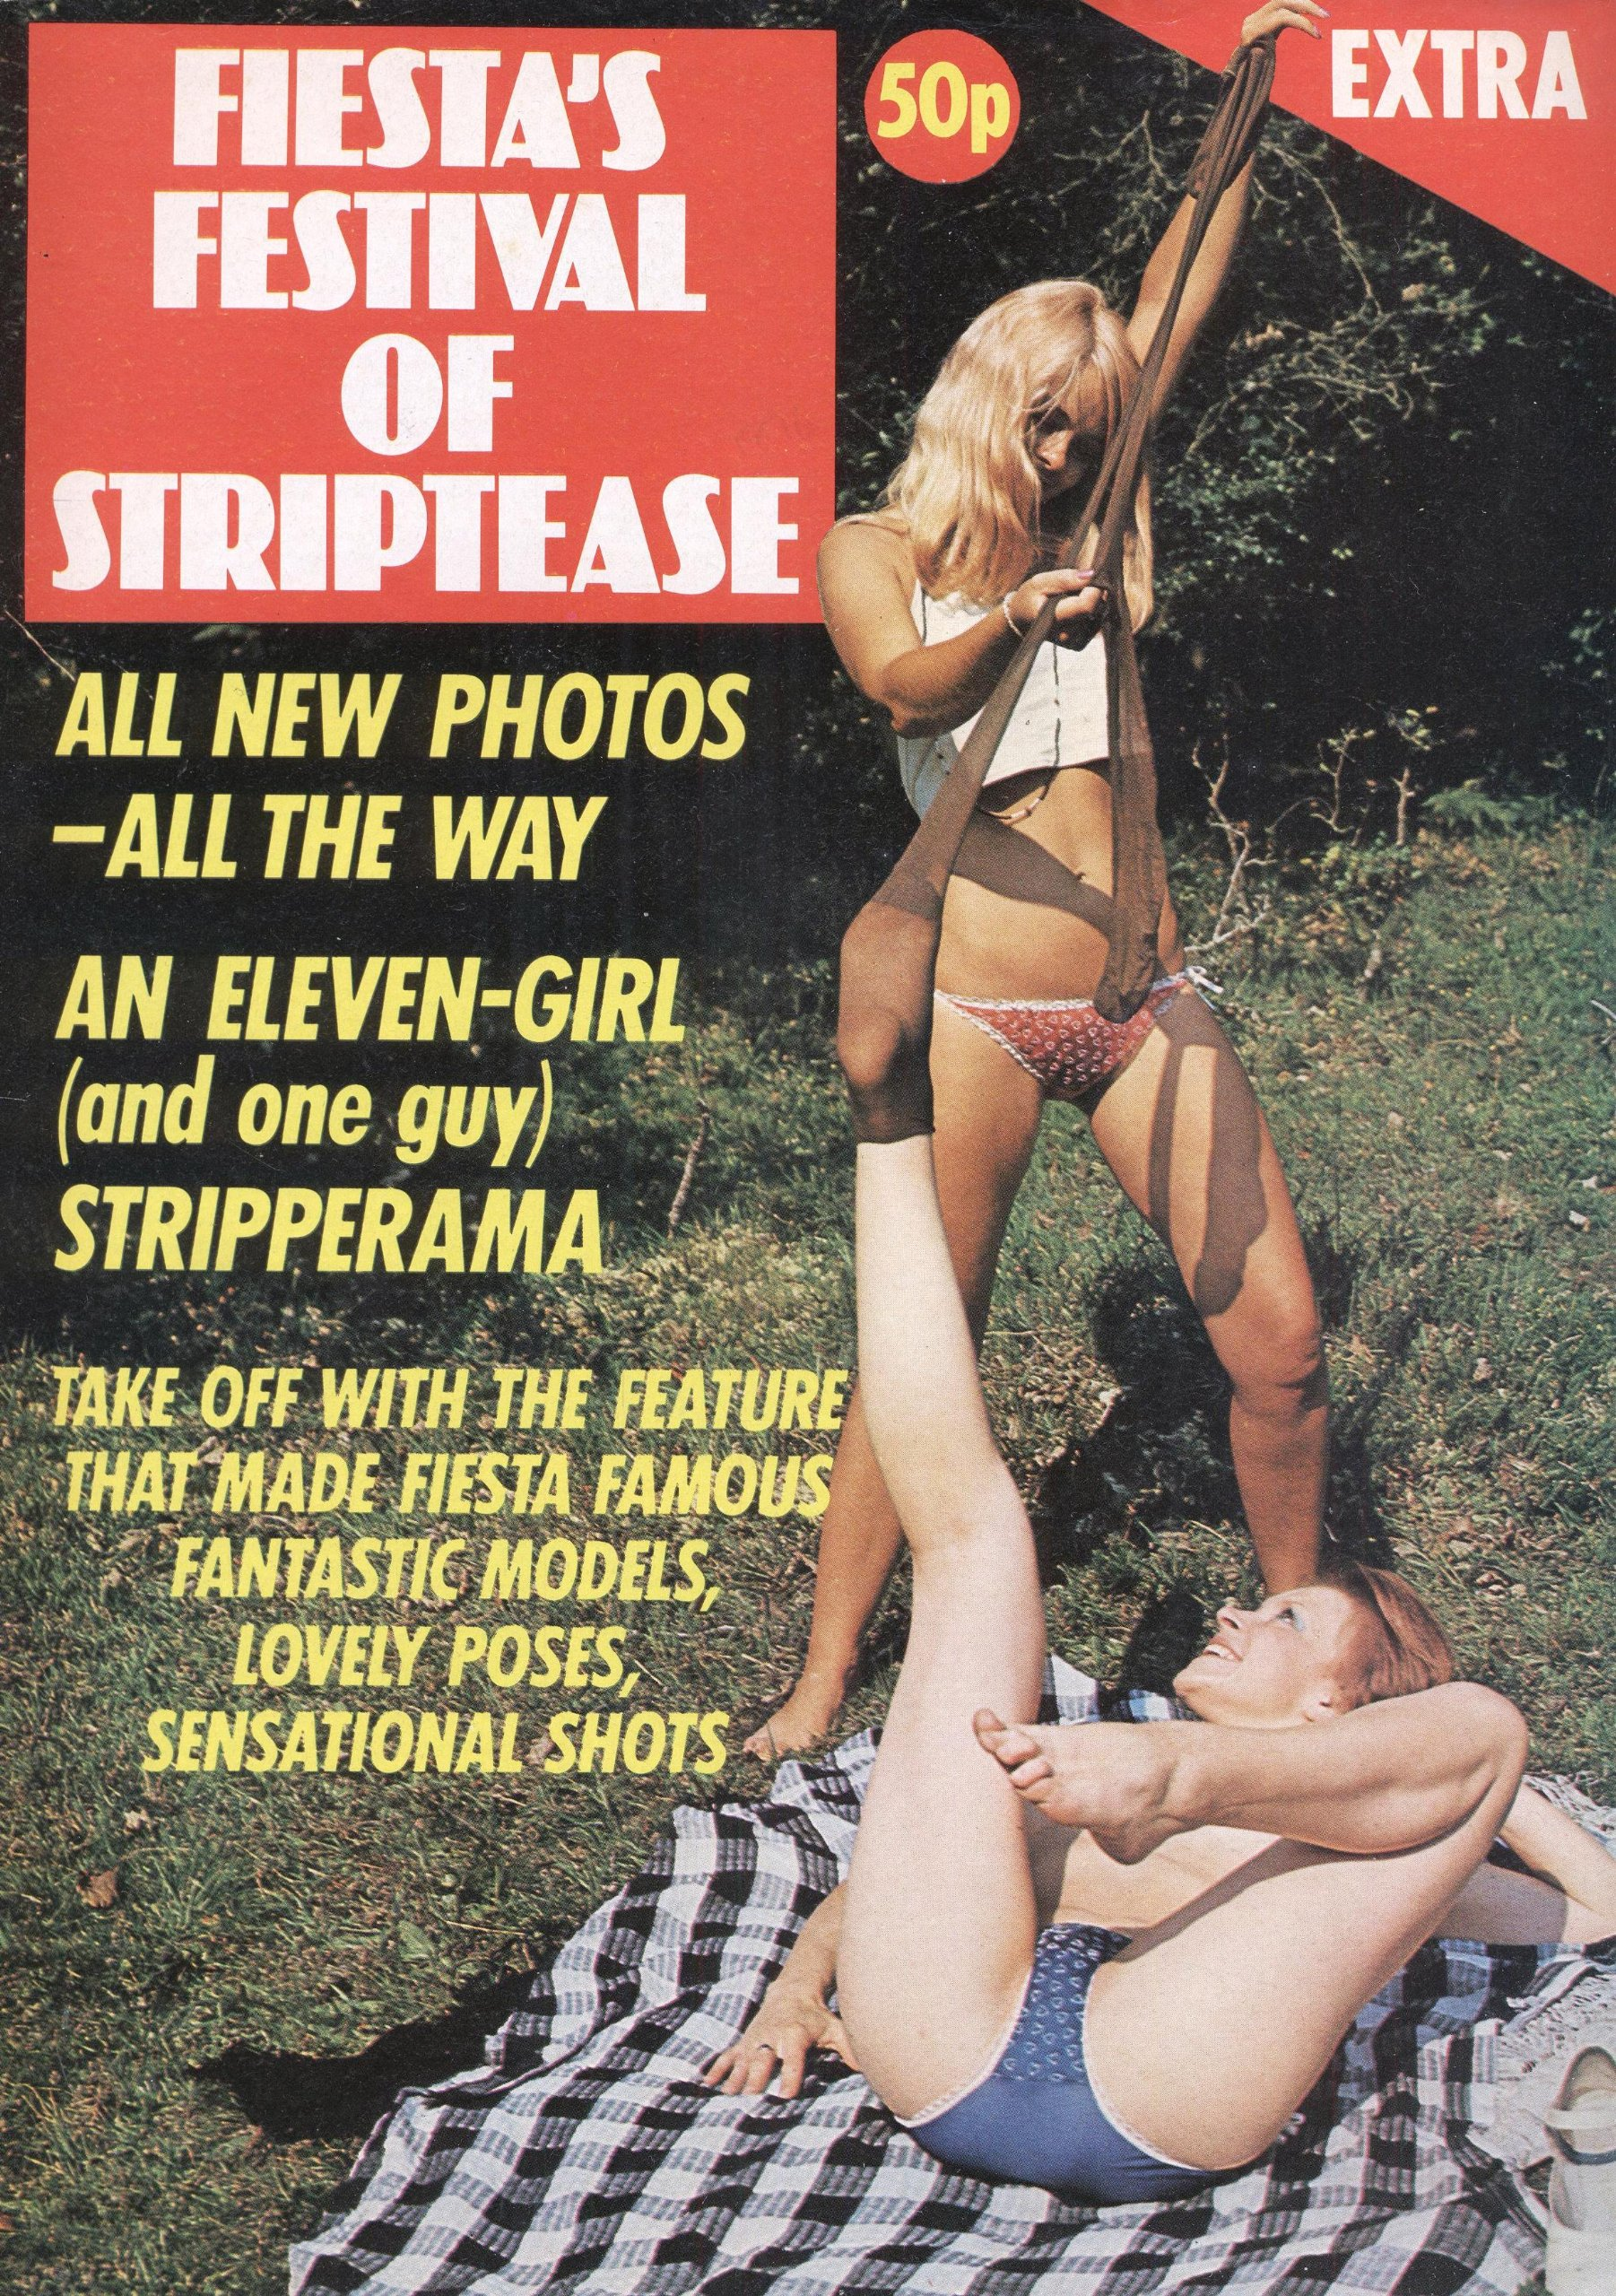 Fiesta con strip tease assured